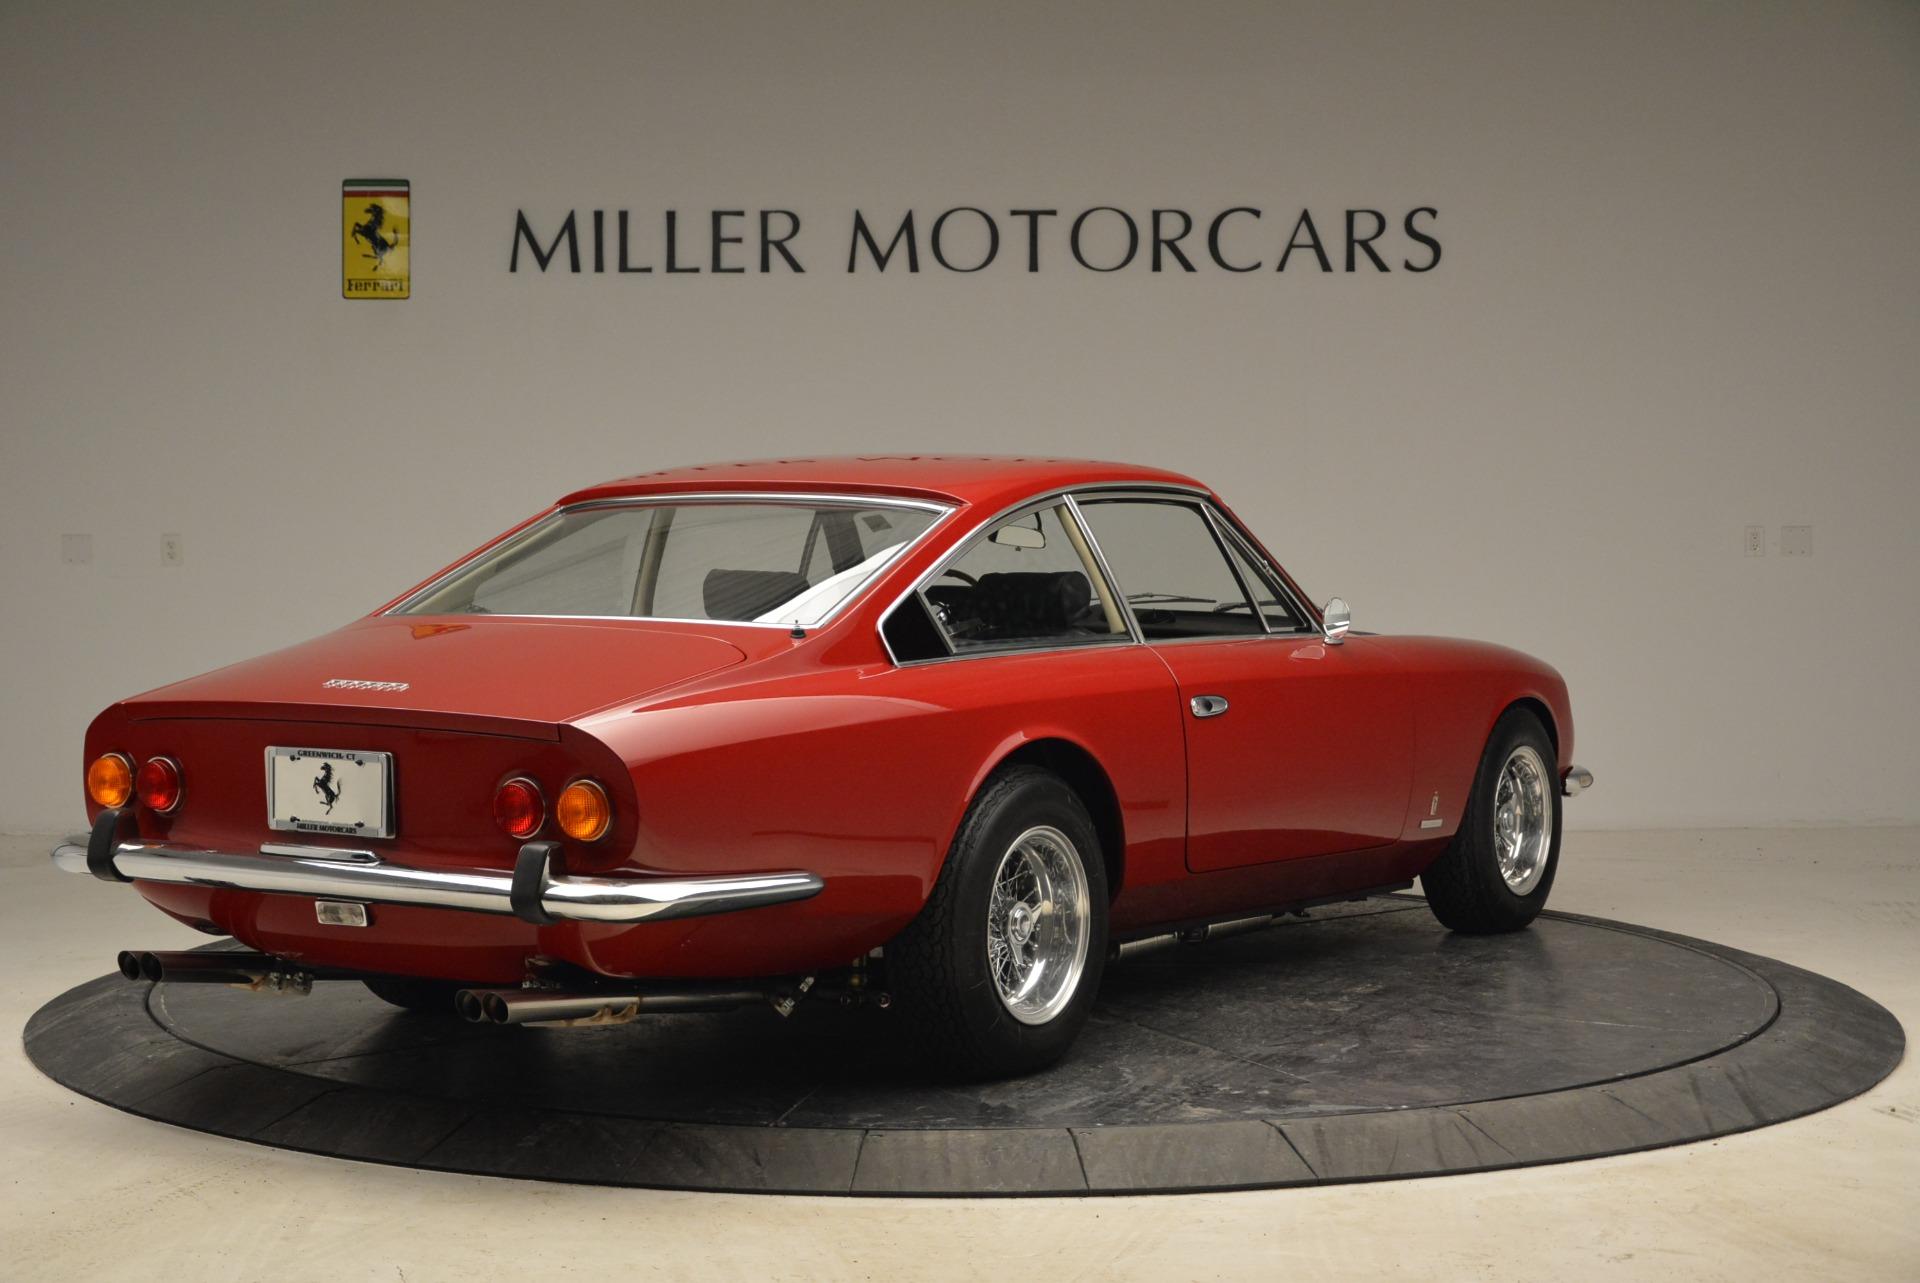 Used 1969 Ferrari 365 GT 2+2  For Sale In Greenwich, CT 1995_p7